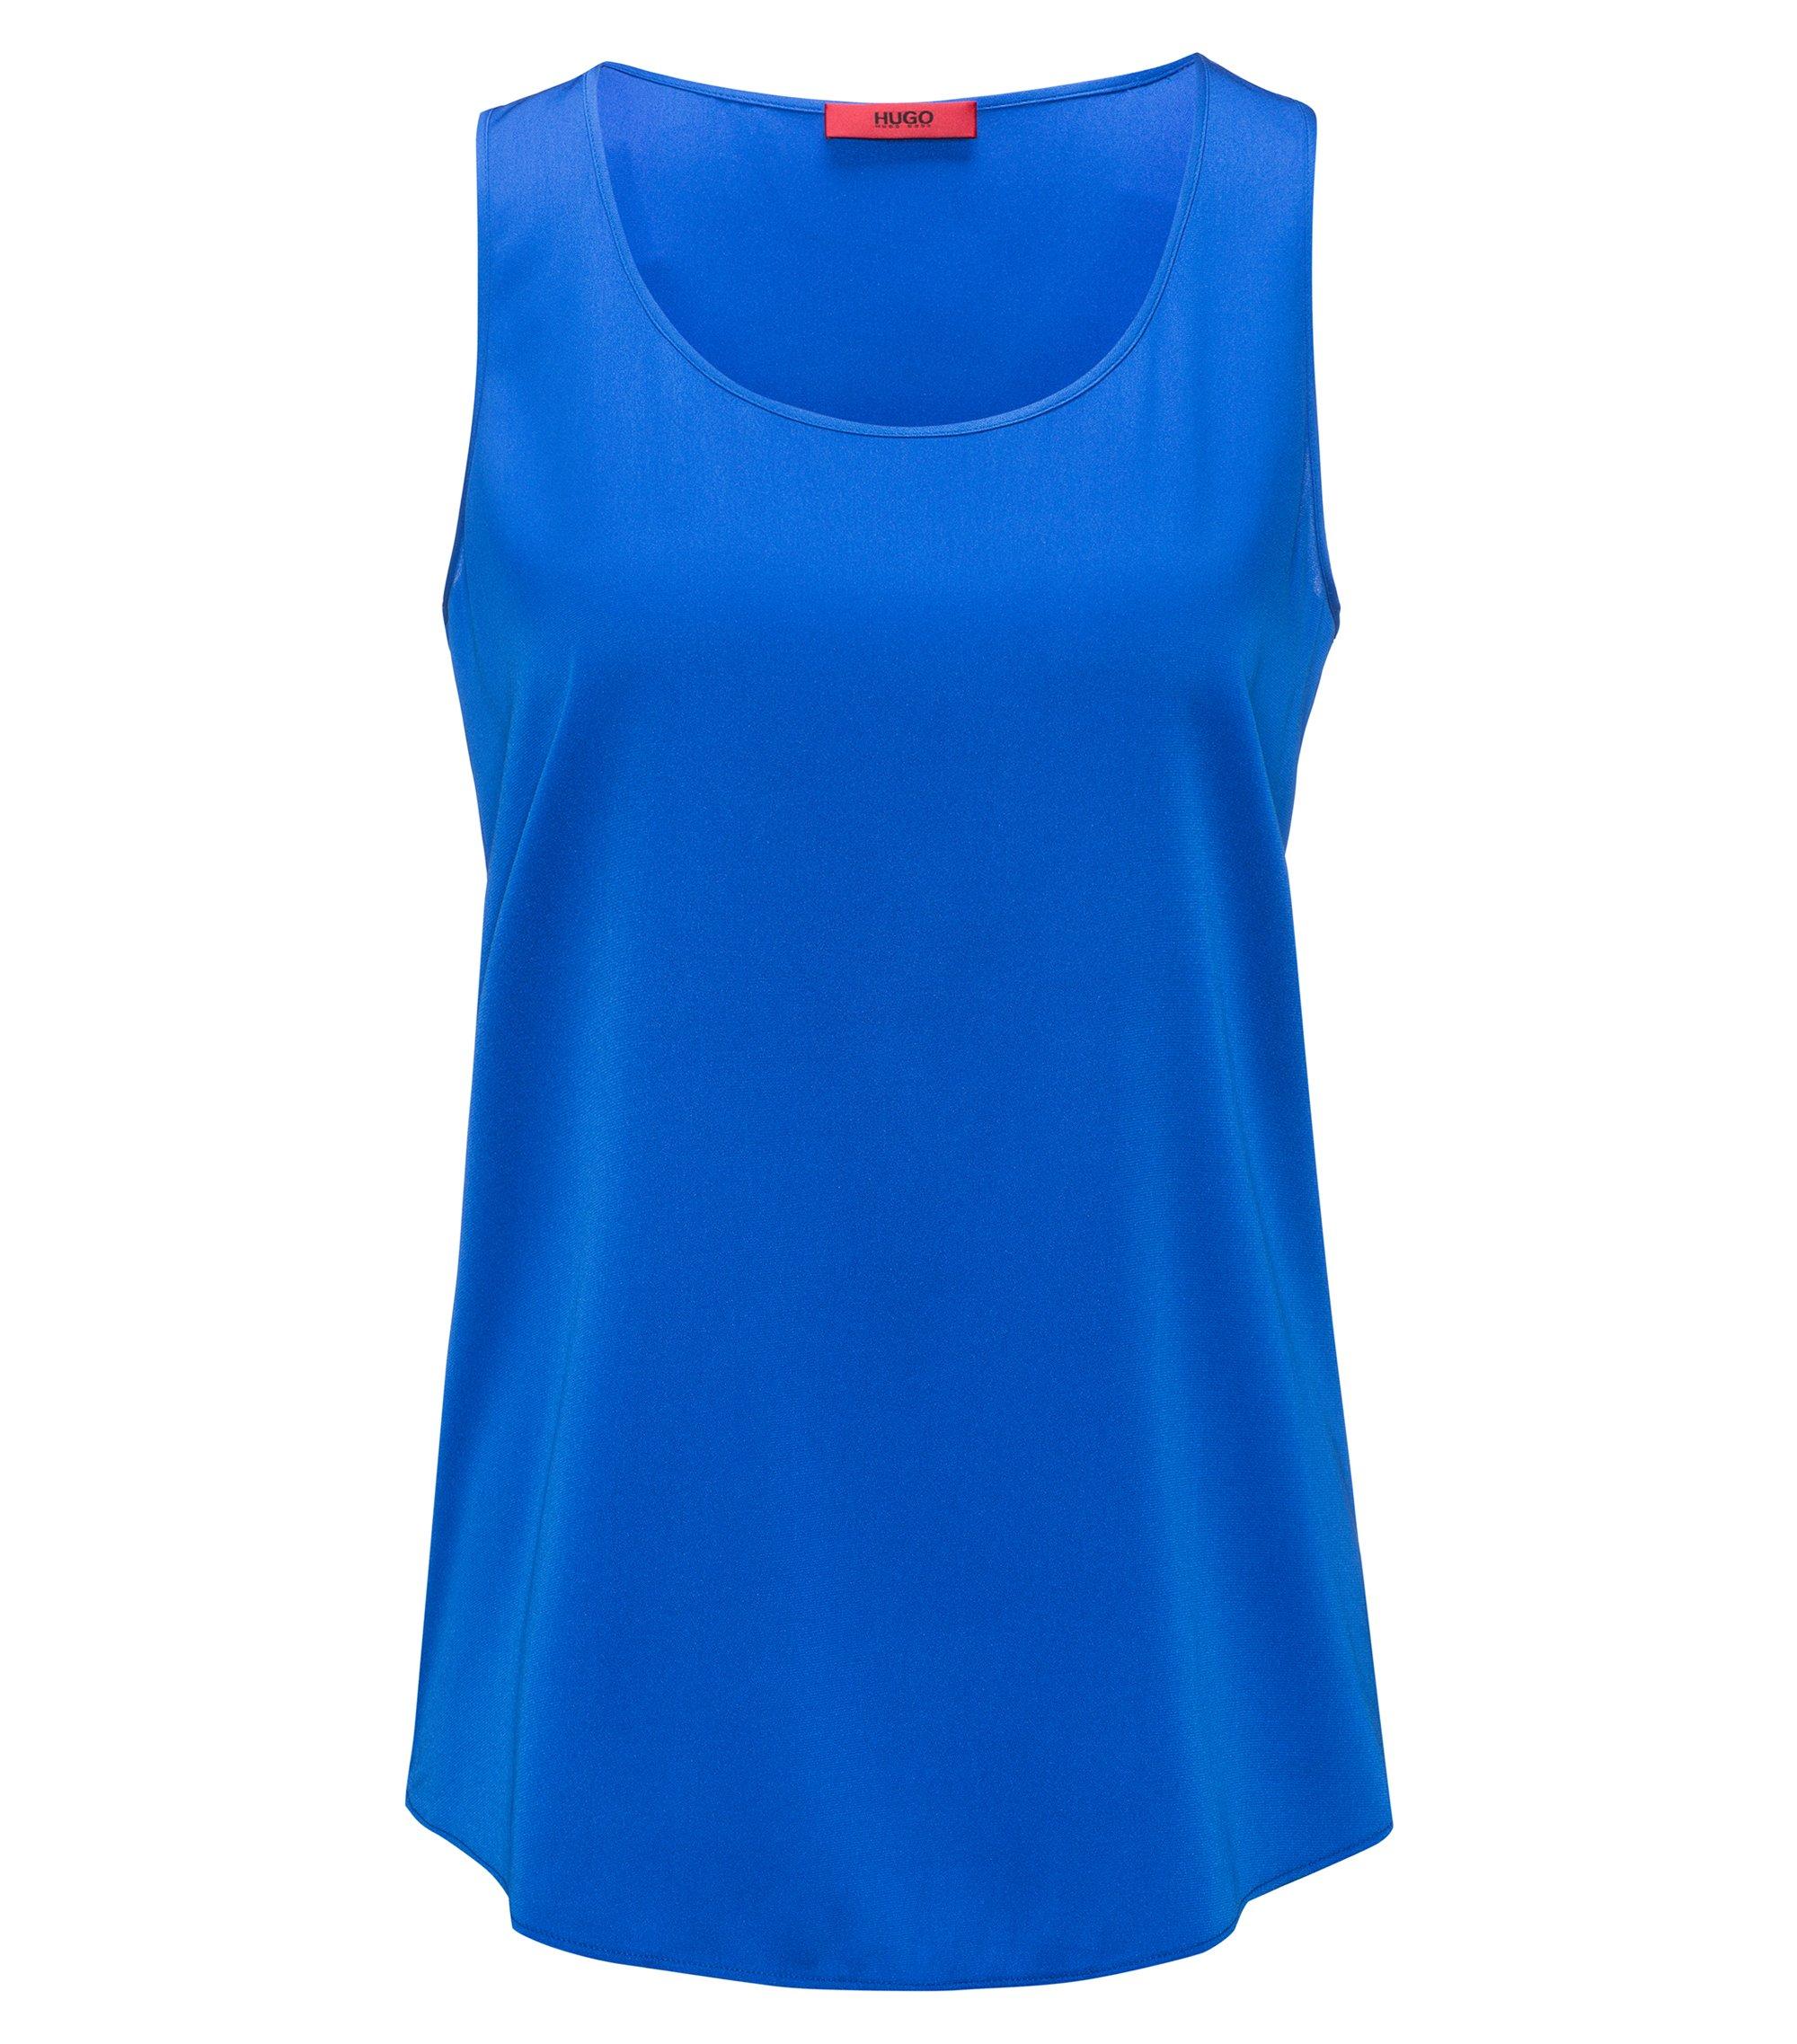 Silk Blend Top | Cendis, Blue